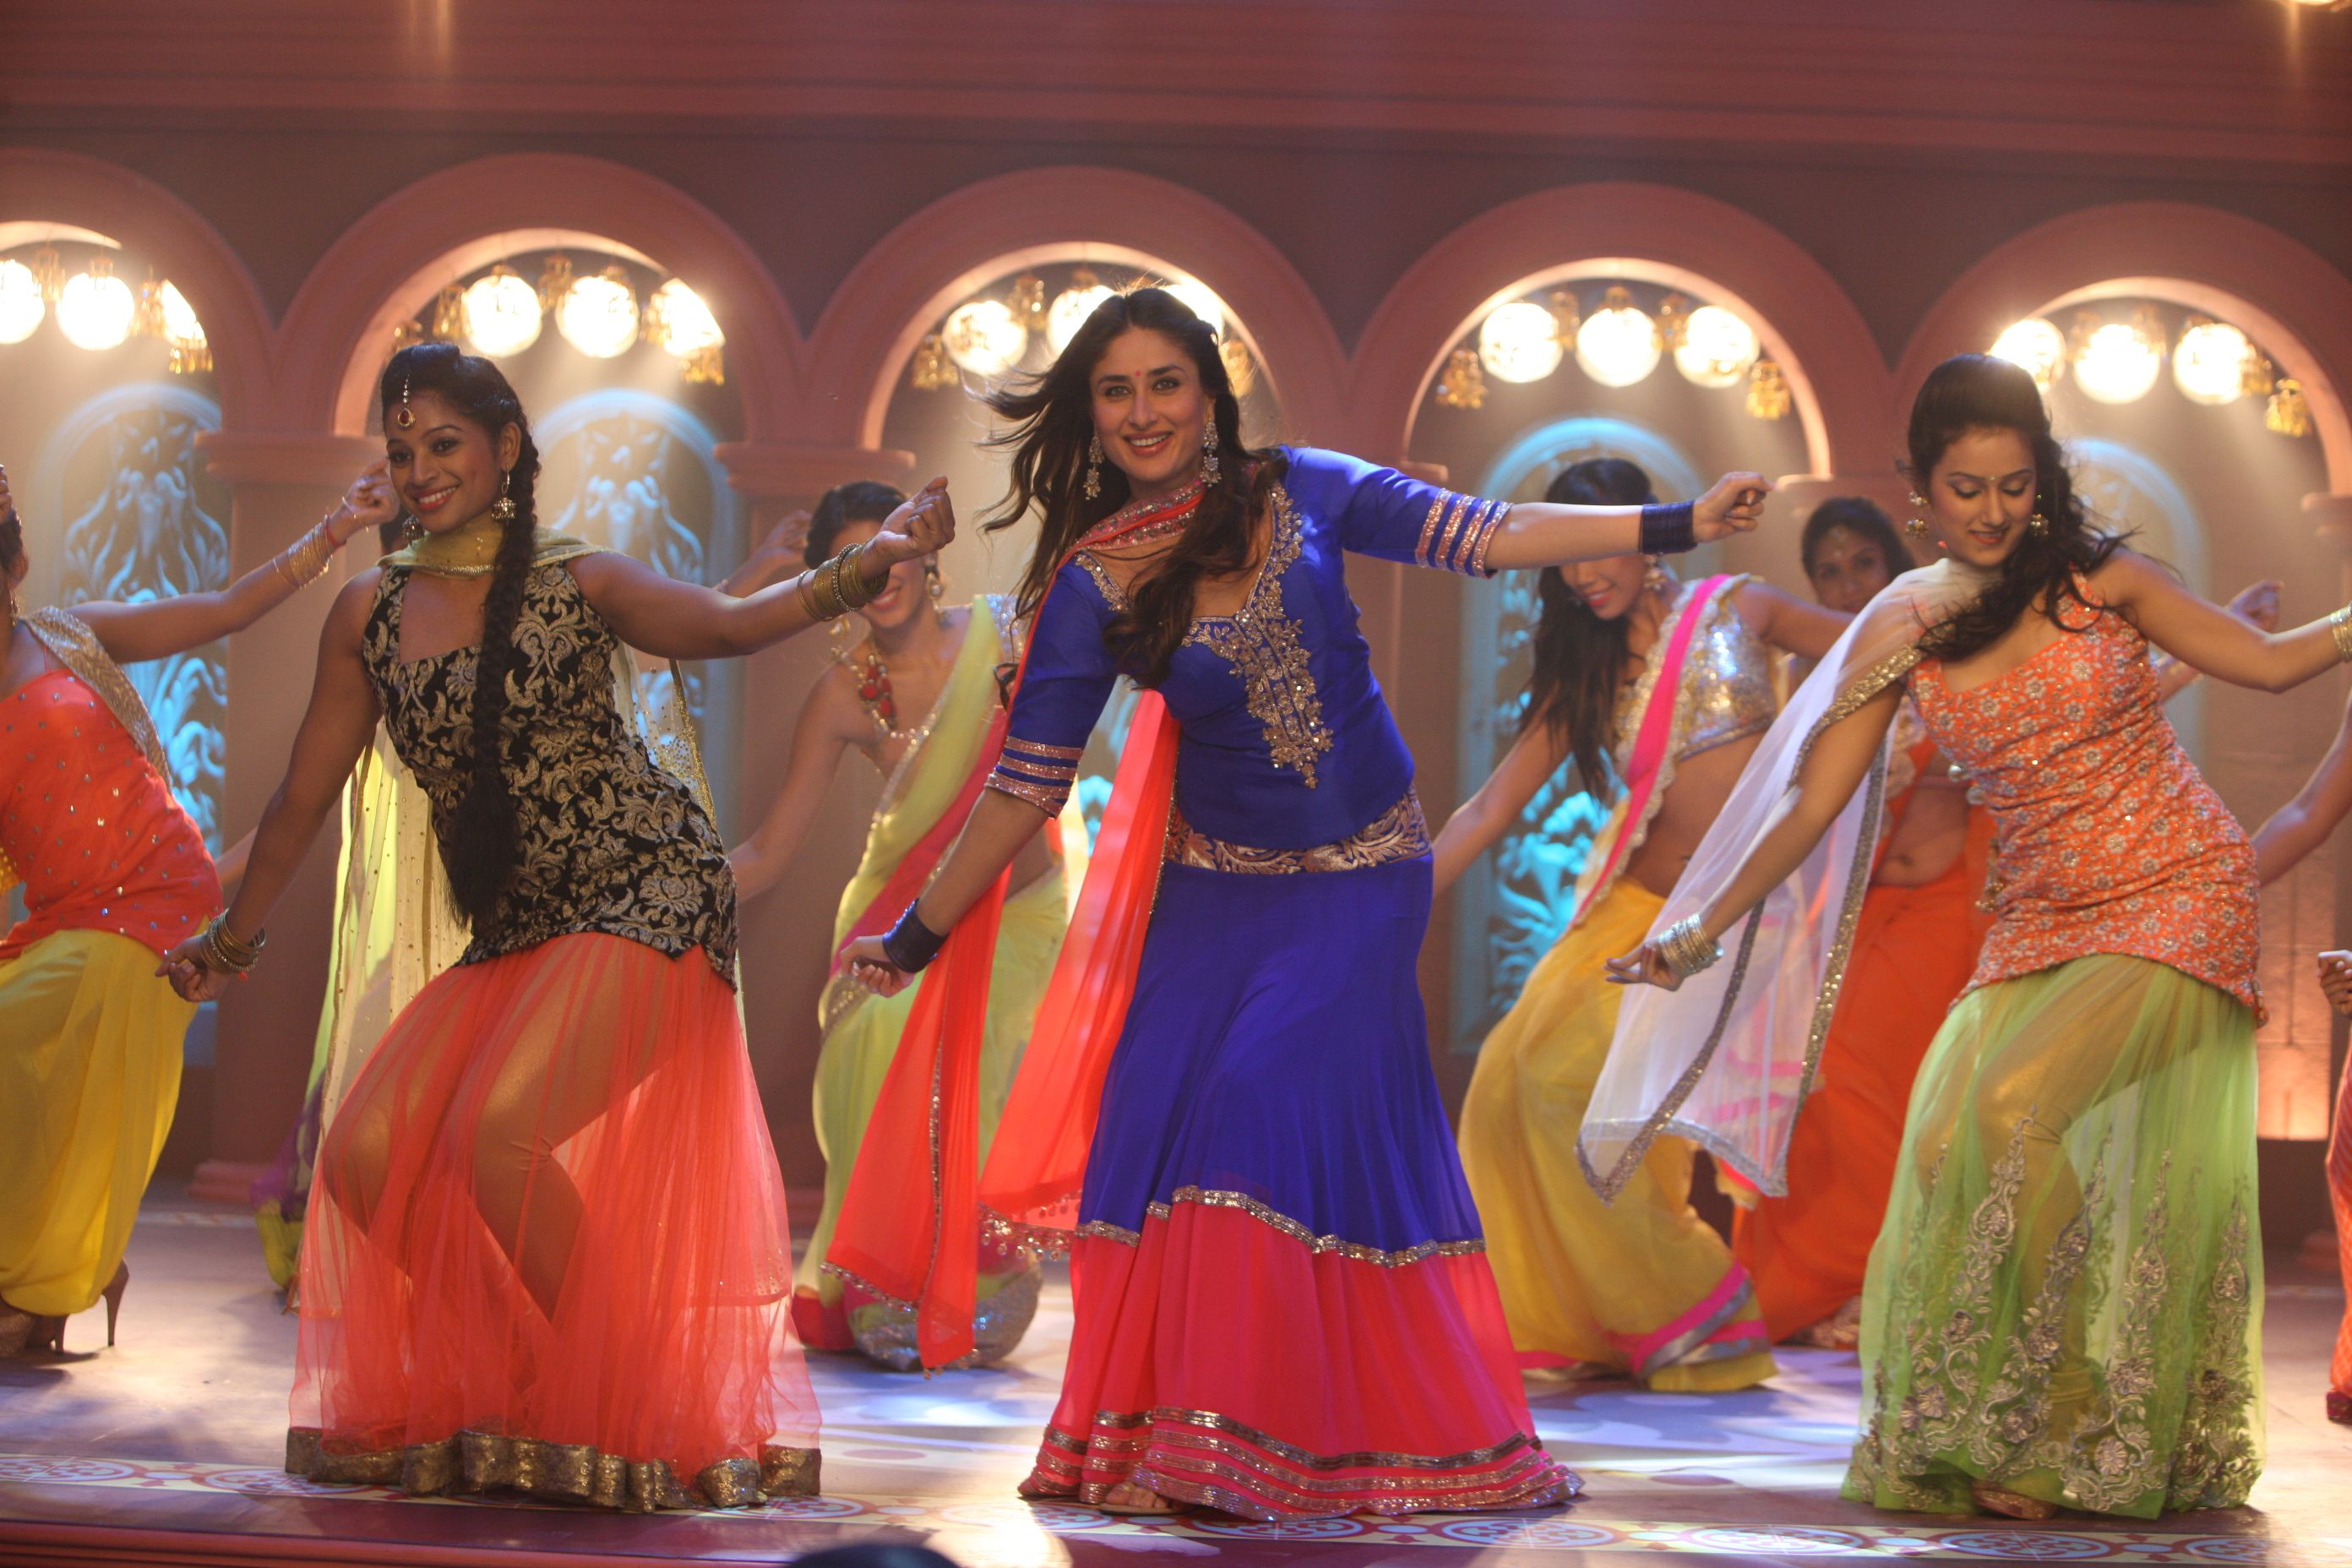 A still from 'Tooh' | Bollywood dance, Asian wedding dress ...